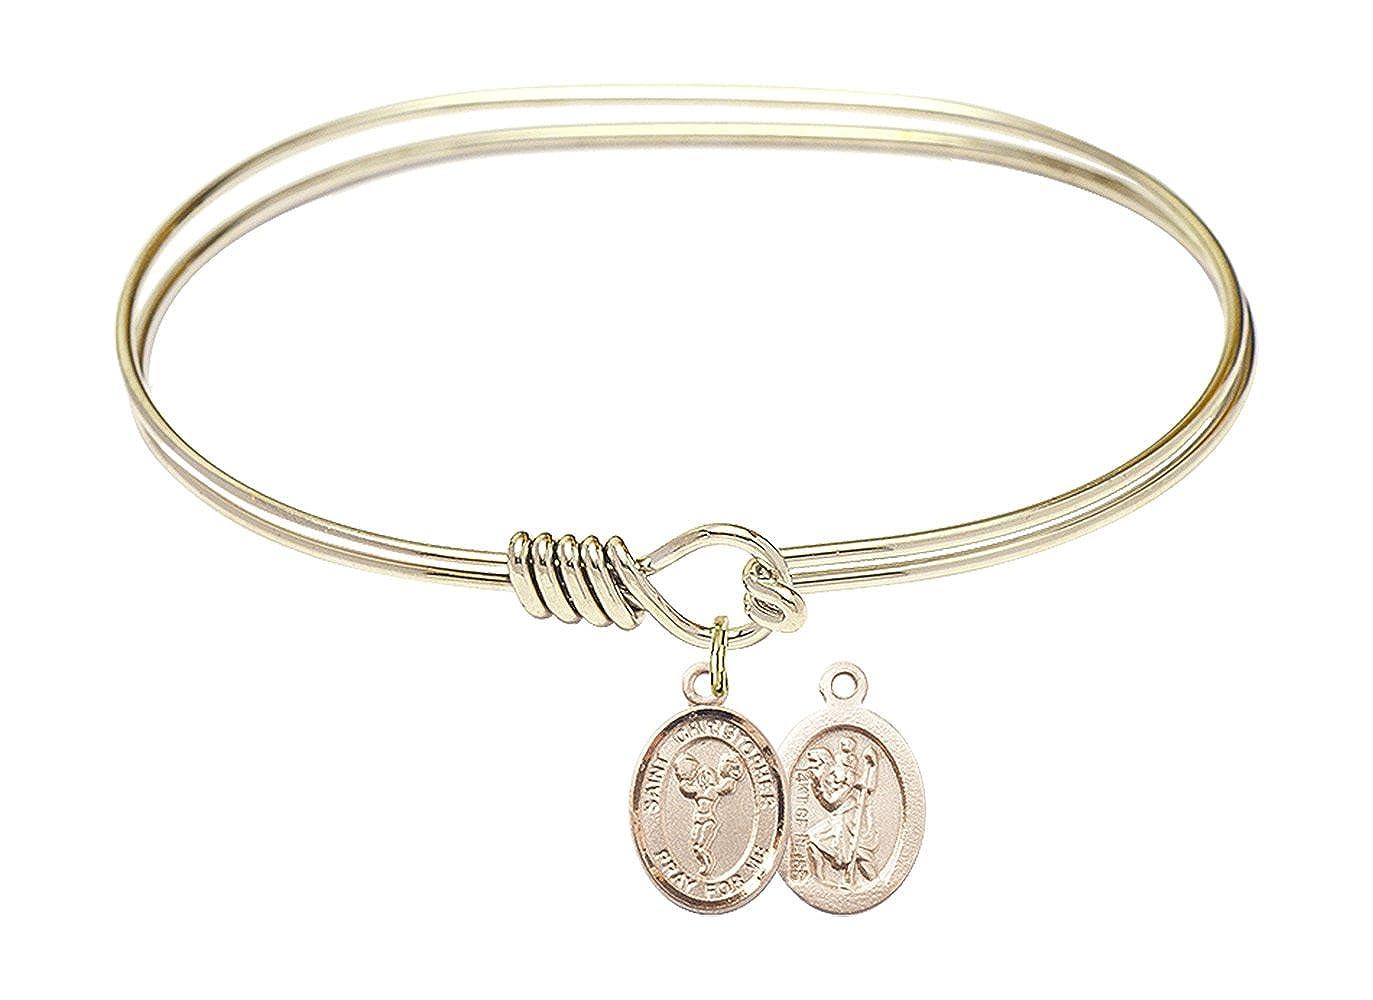 Christopher//Cheerleading Charm. DiamondJewelryNY Eye Hook Bangle Bracelet with a St